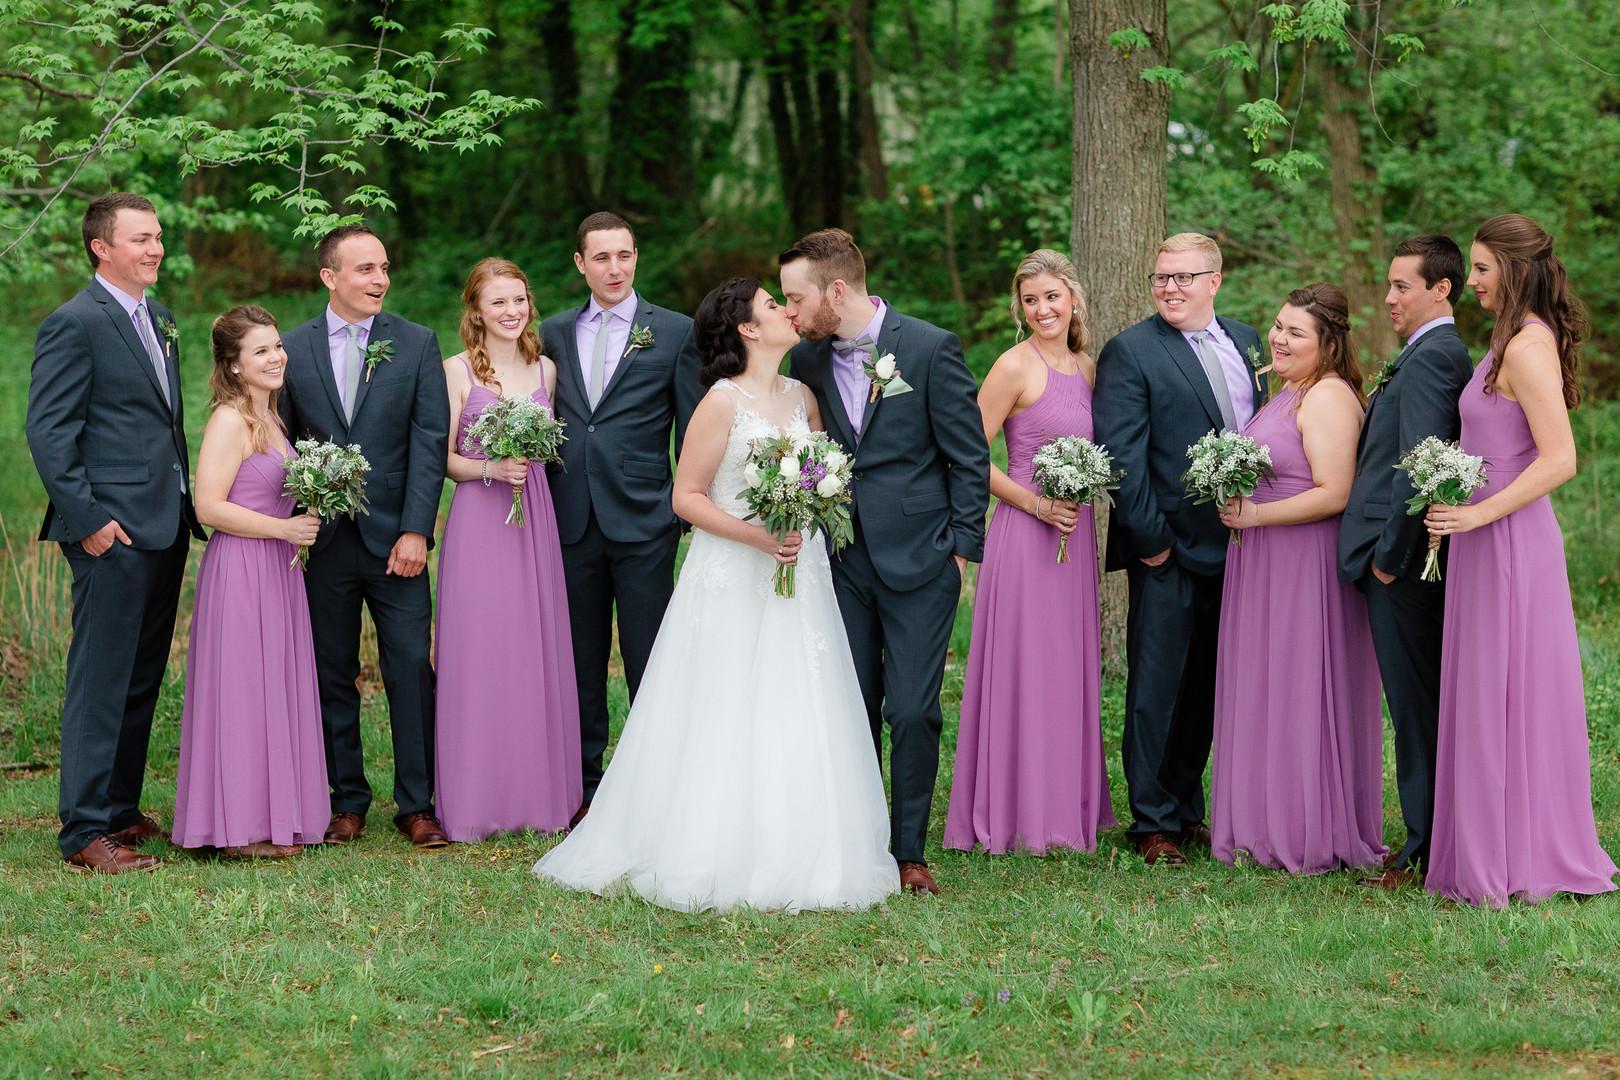 Maryland_Wedding_Photographer06.jpg